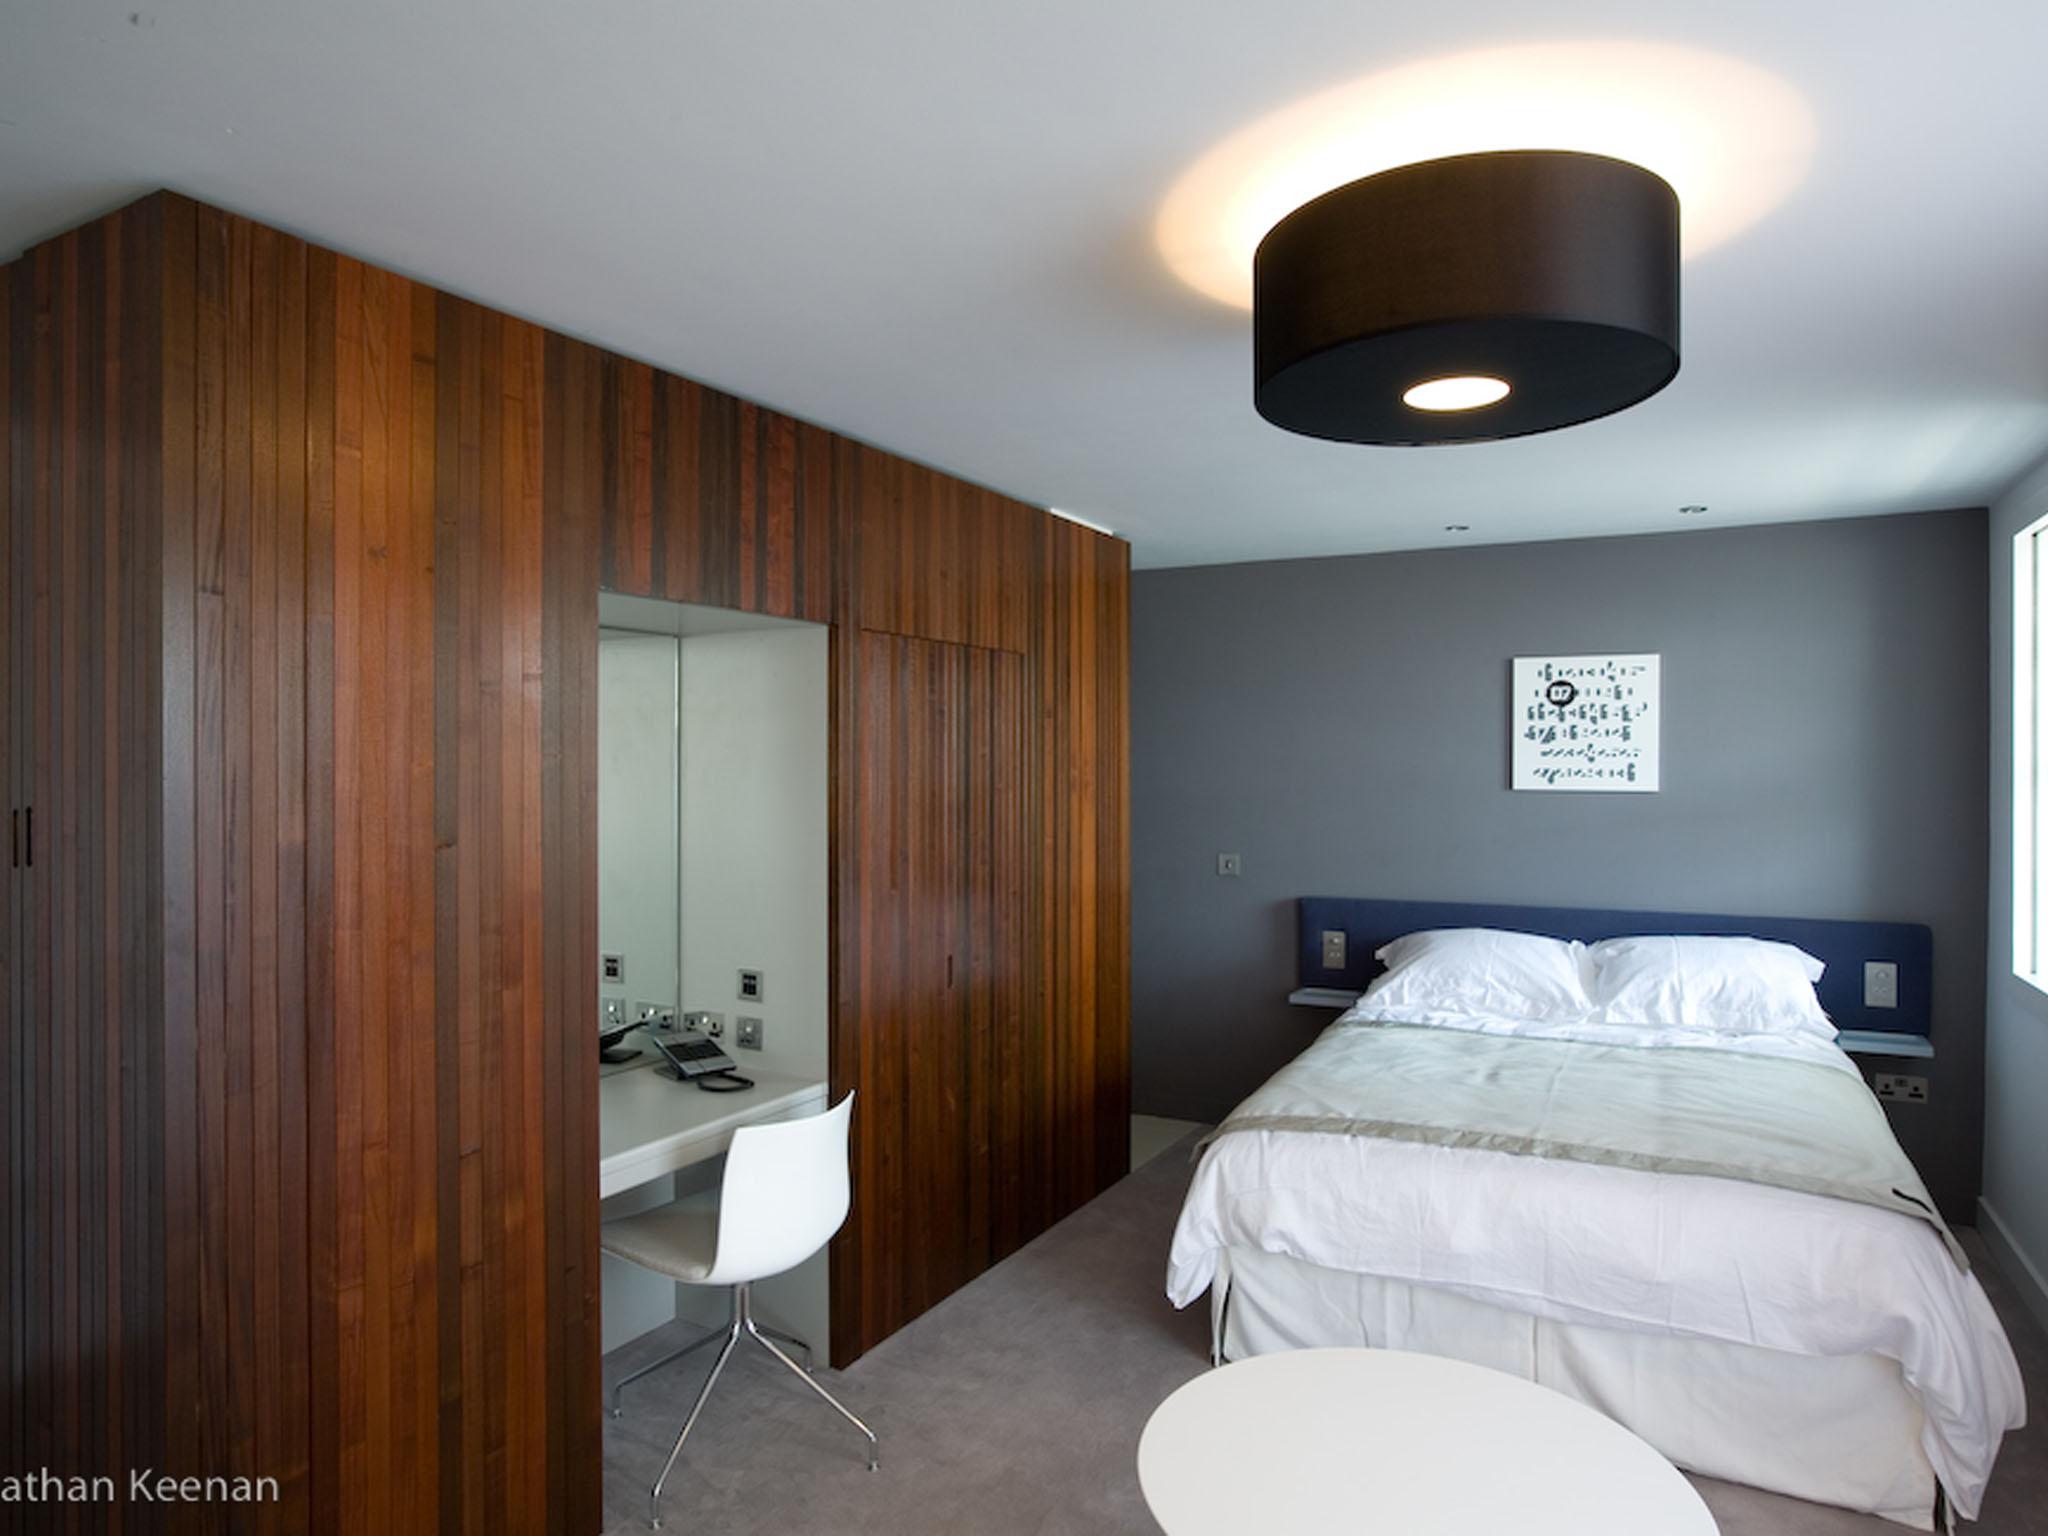 Midland Hotel Bedroom 4